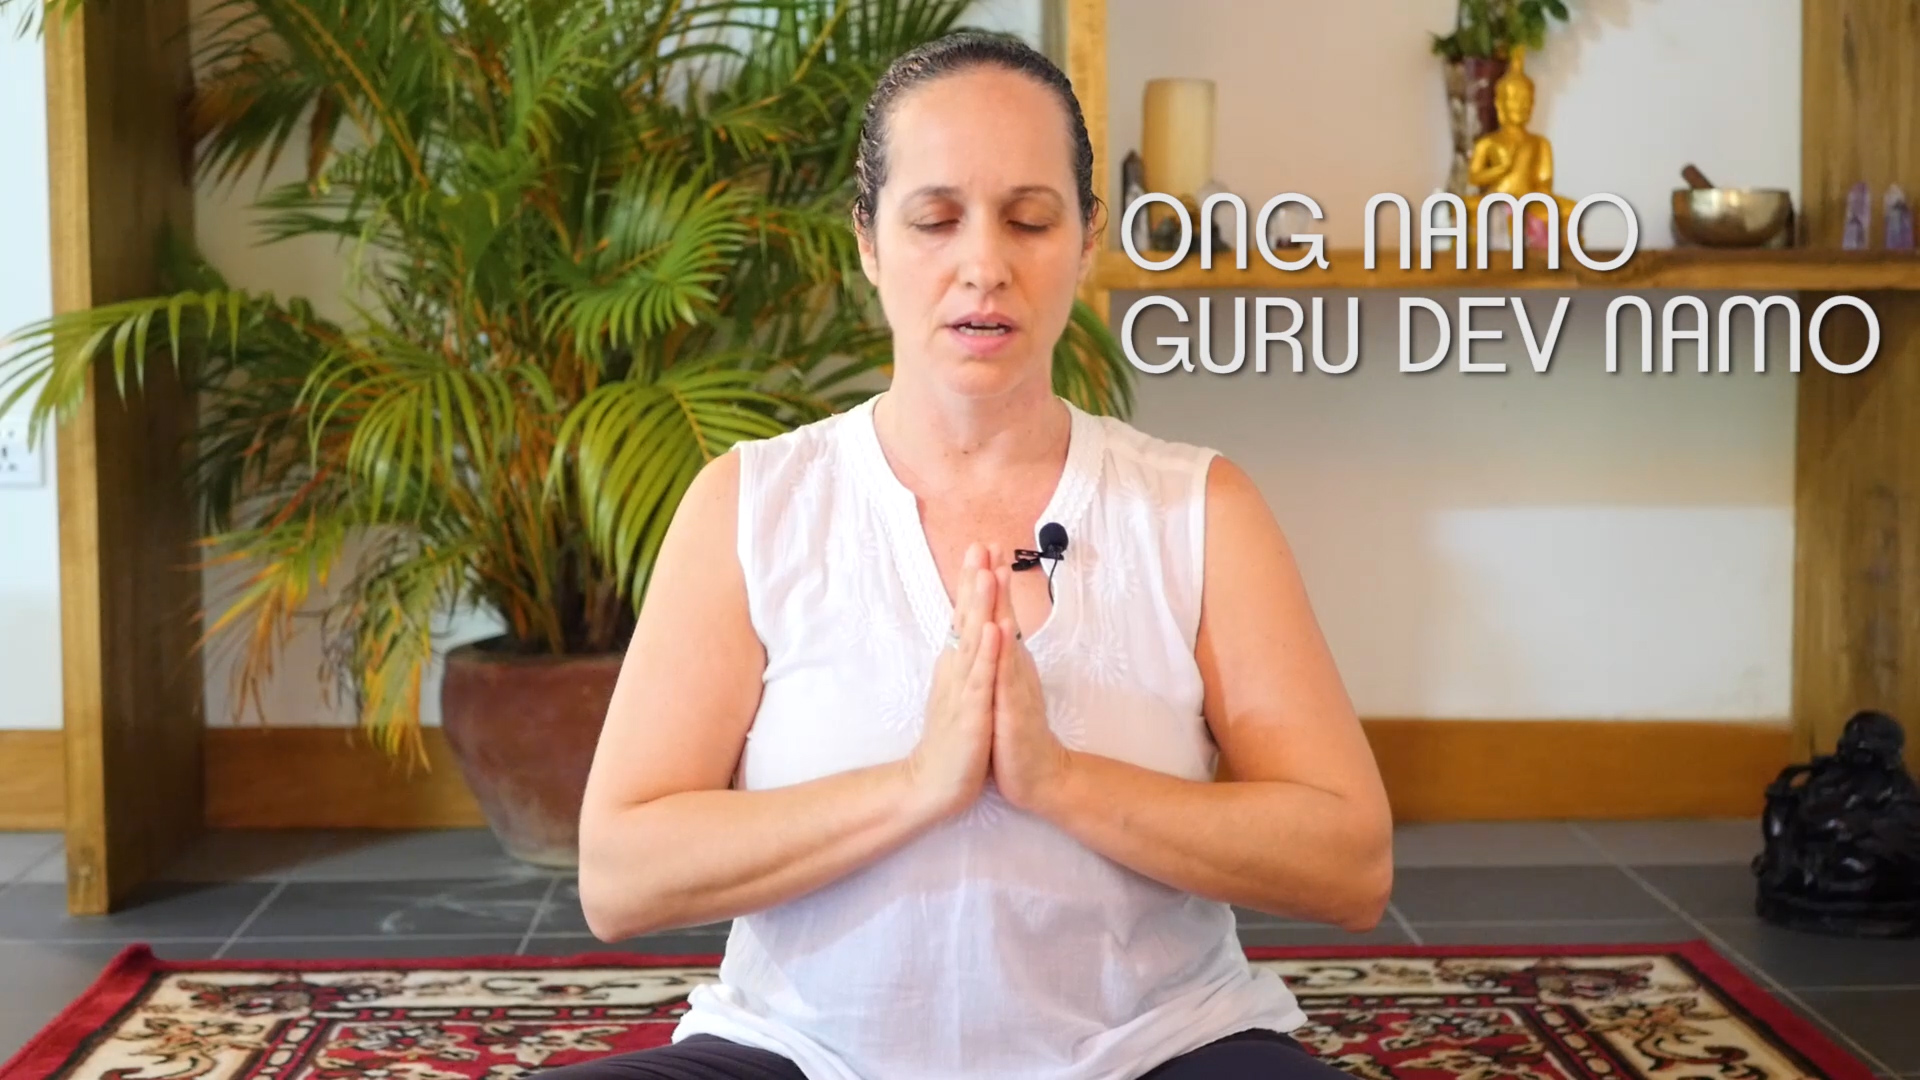 Healing Meditation (20 minutes)